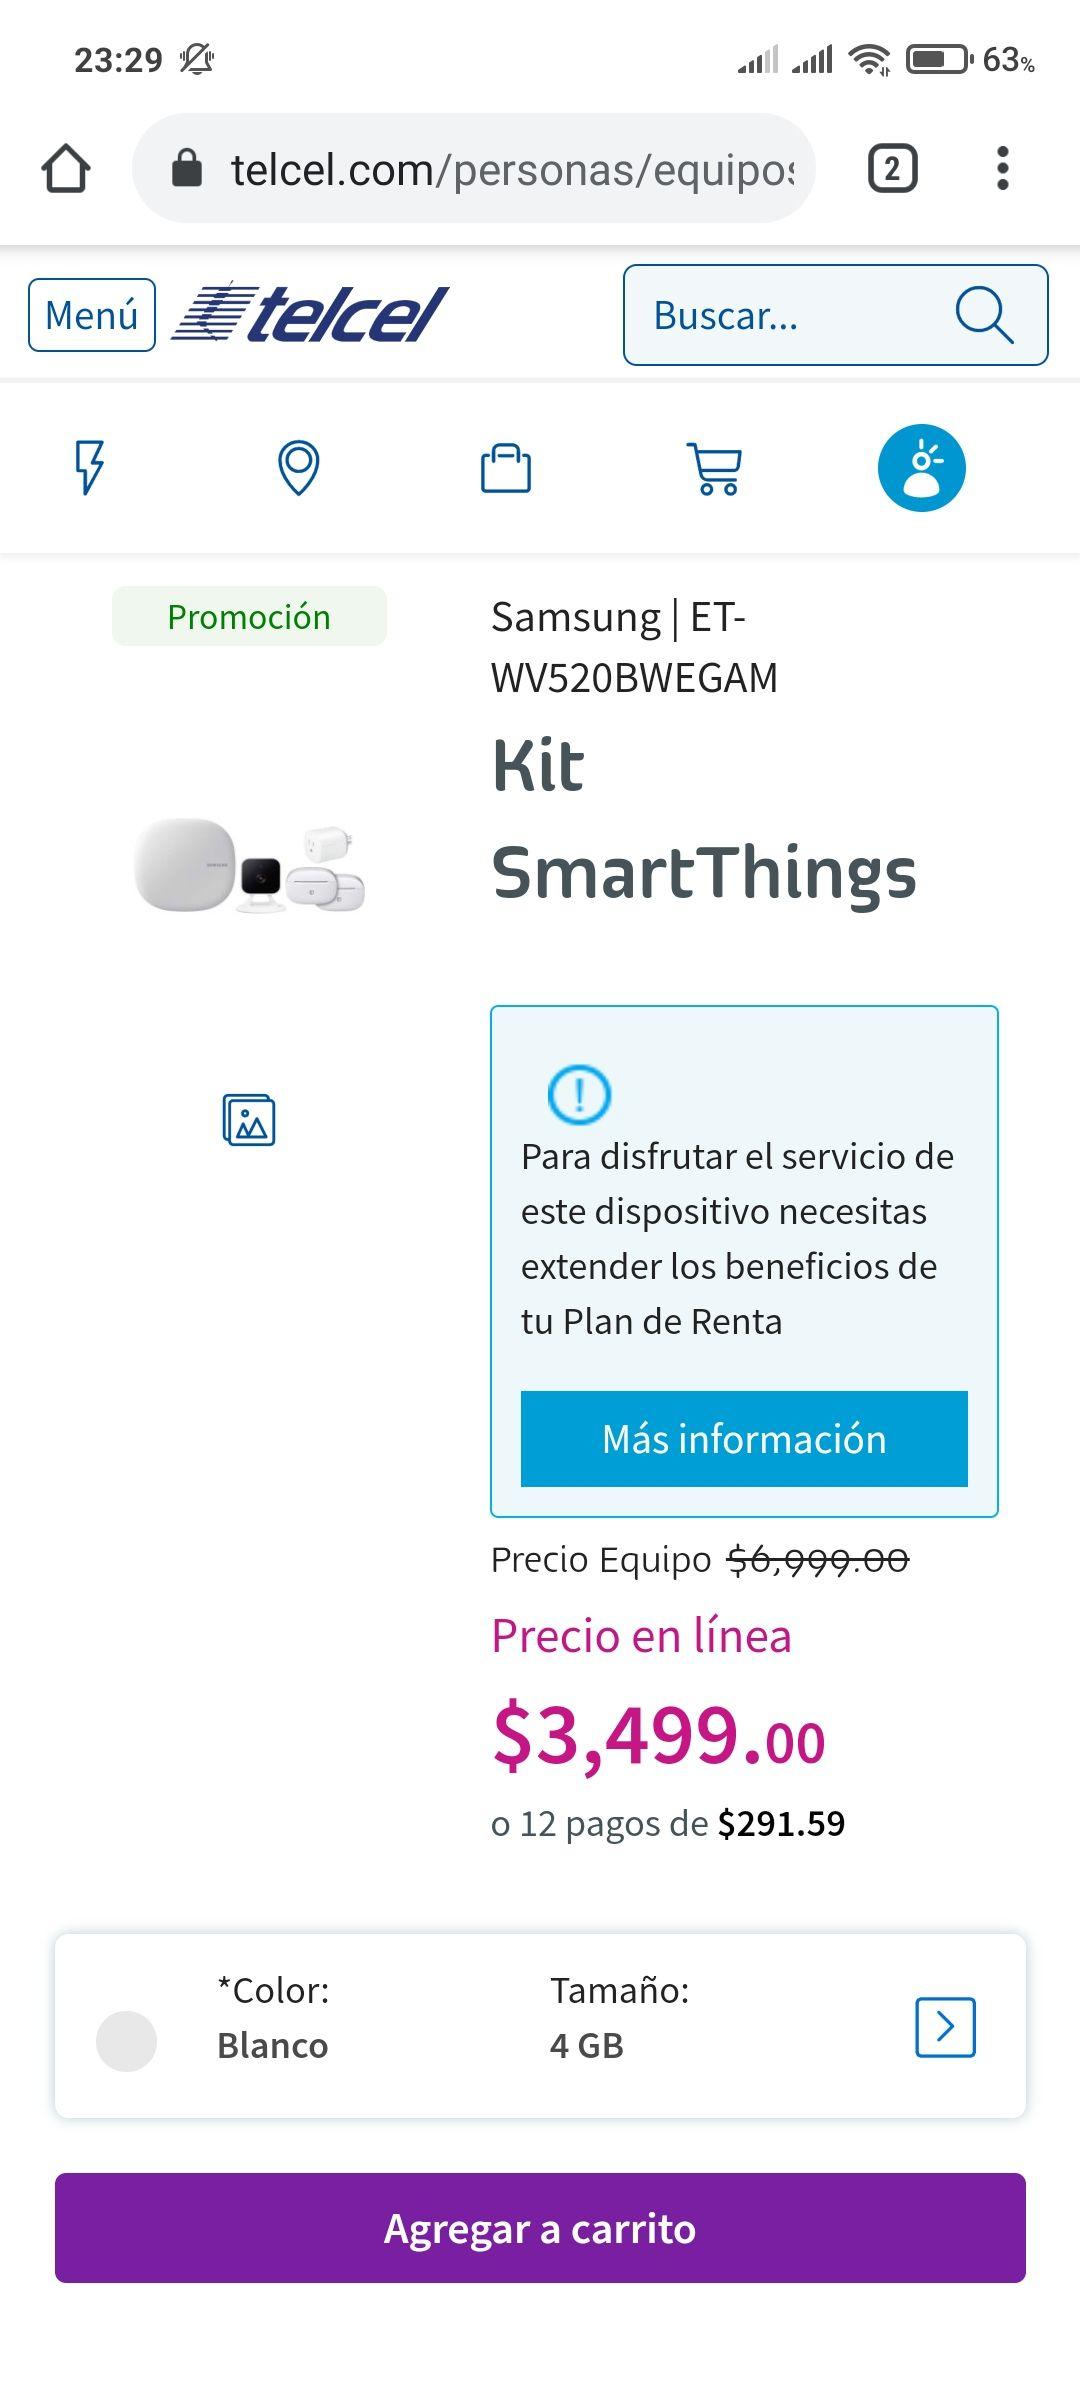 Telcel: Kit SmartThings